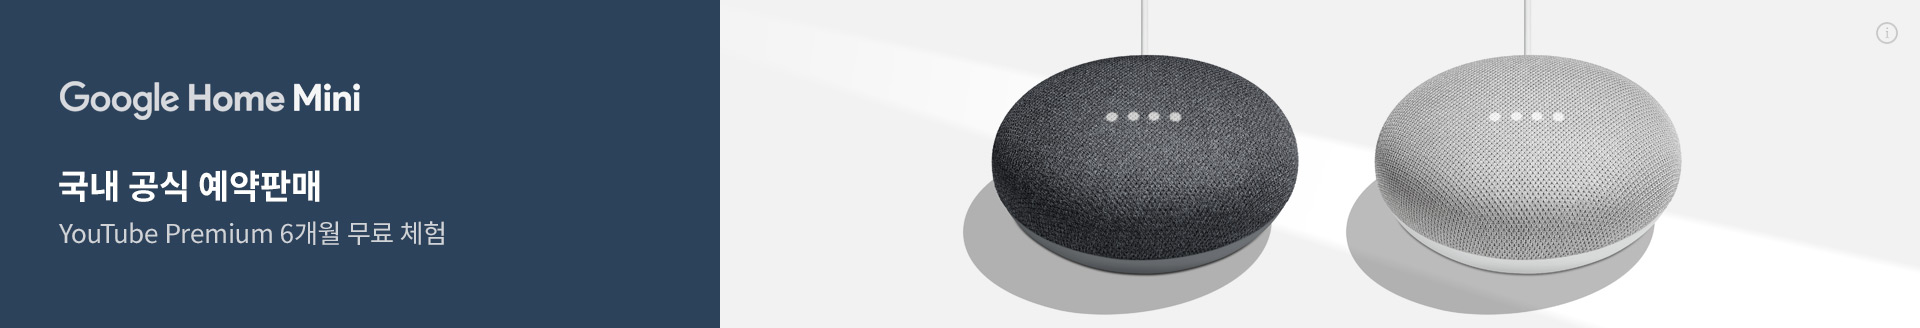 Google Home Mini 국내 공식 예약판매